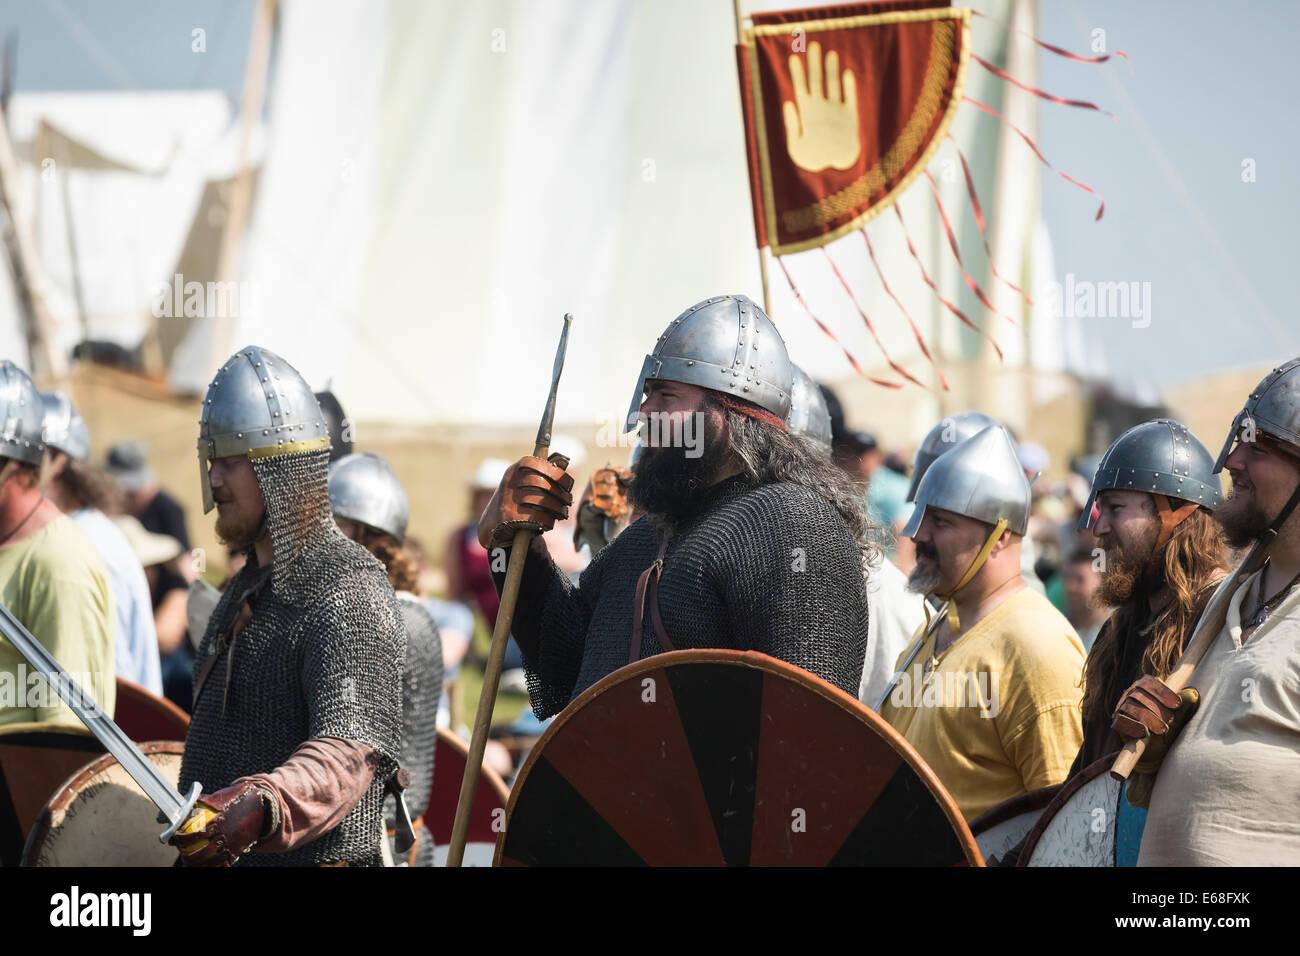 Vikings in battle re-enactment at the Icelandic Festival of Manitoba, Gimli, Manitoba, Canada - Stock Image